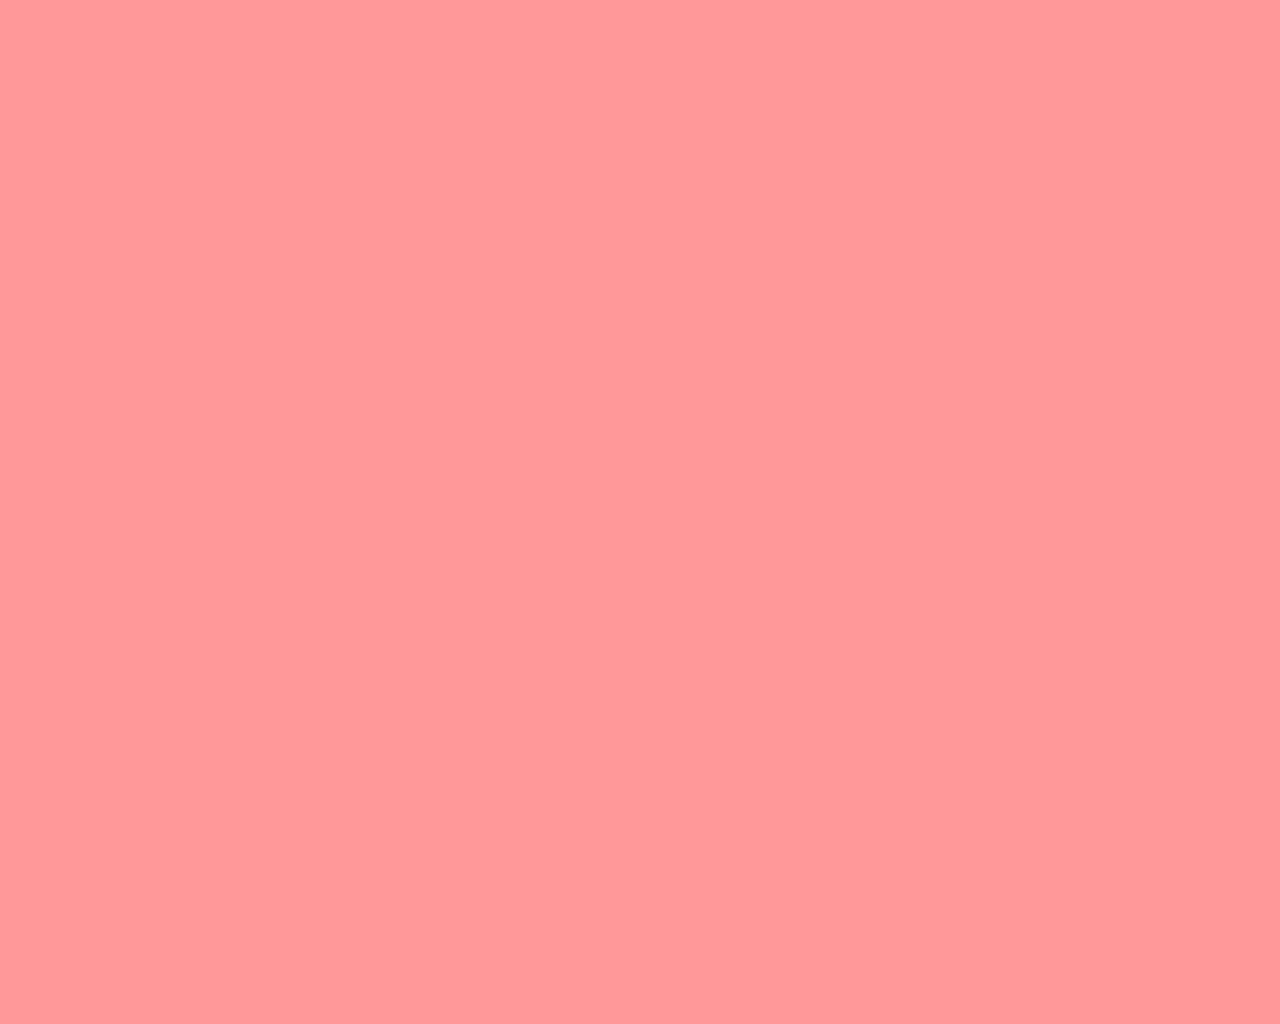 [48+] Salmon Color Wallpaper on WallpaperSafari